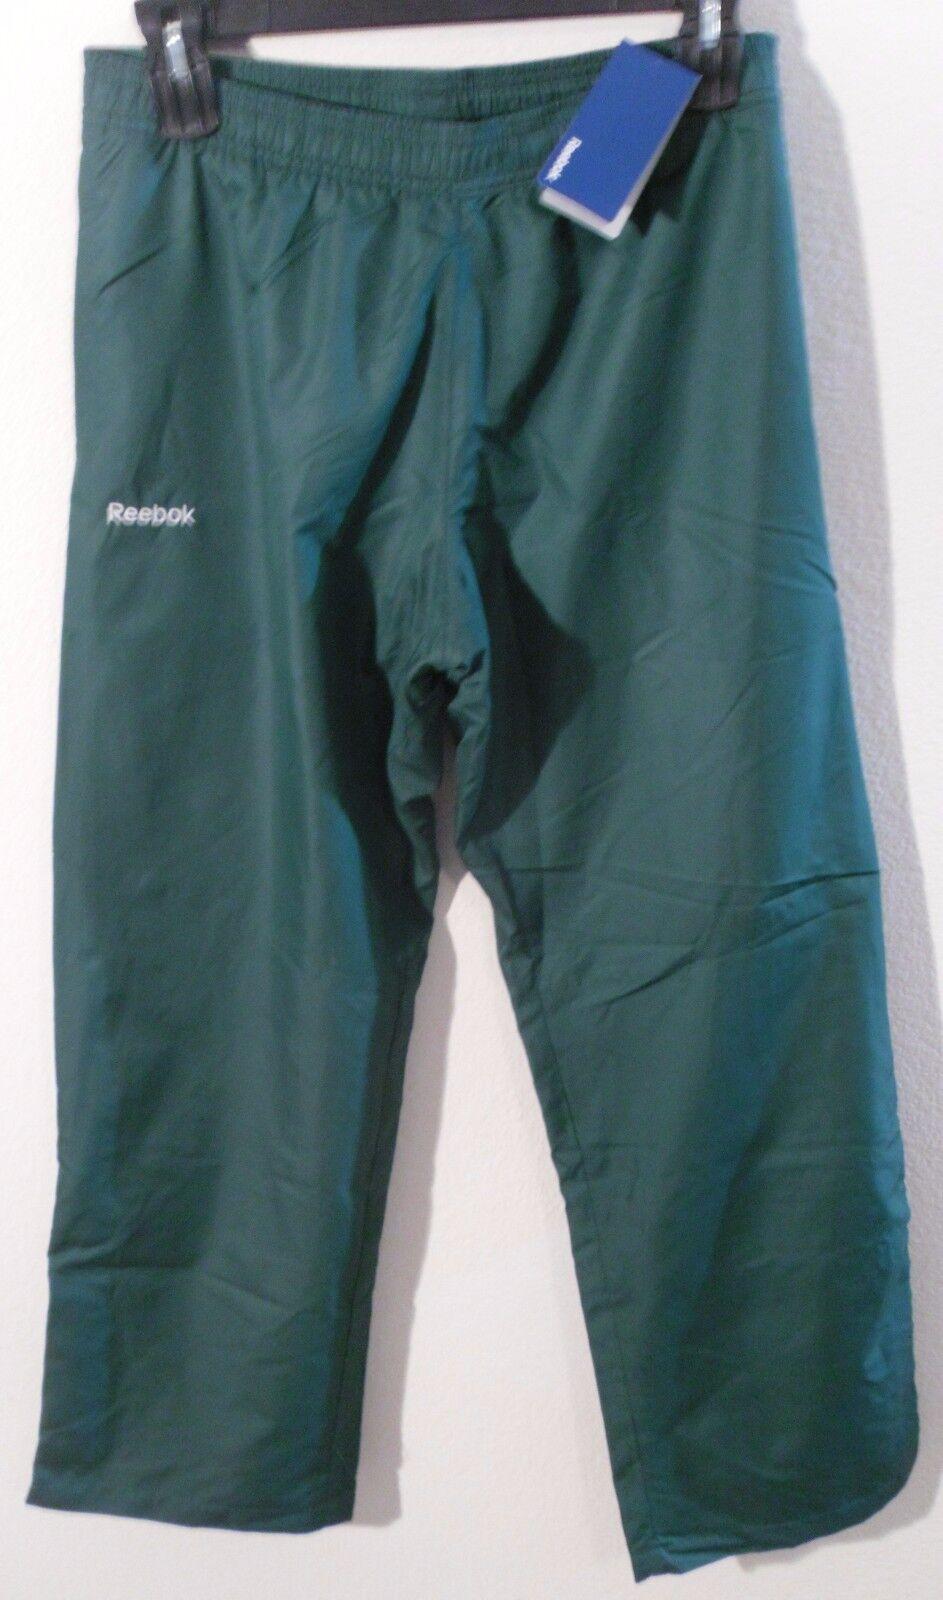 NWT Reebok Womens Athletic Warm-Up Pants L Green MSRP